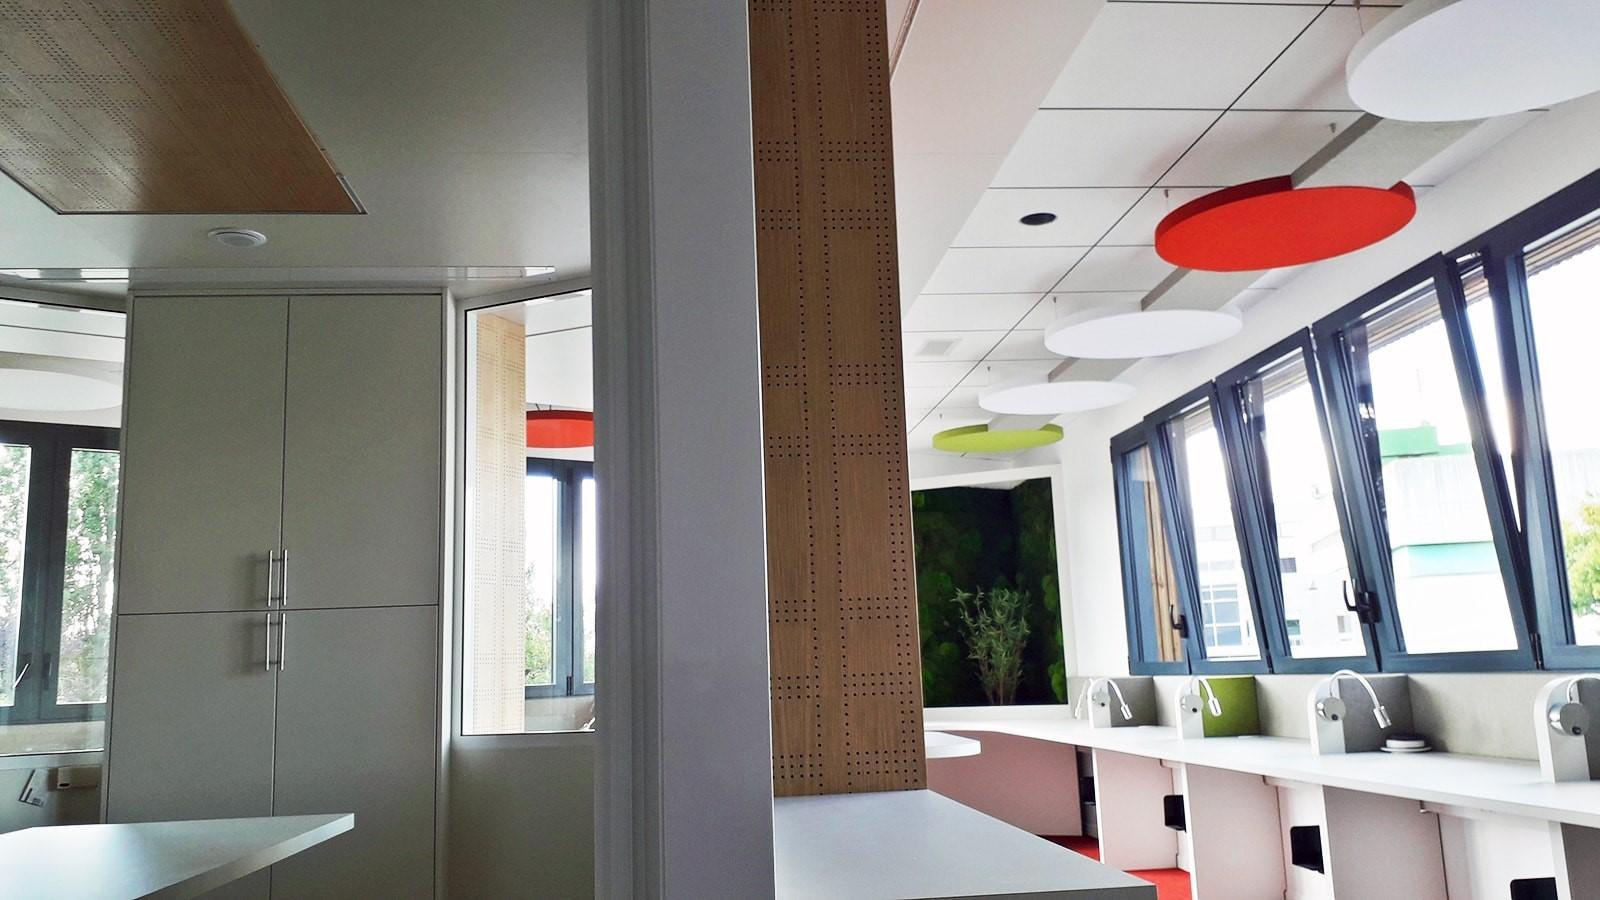 Bureaux Had Cholet Efi Design (6)